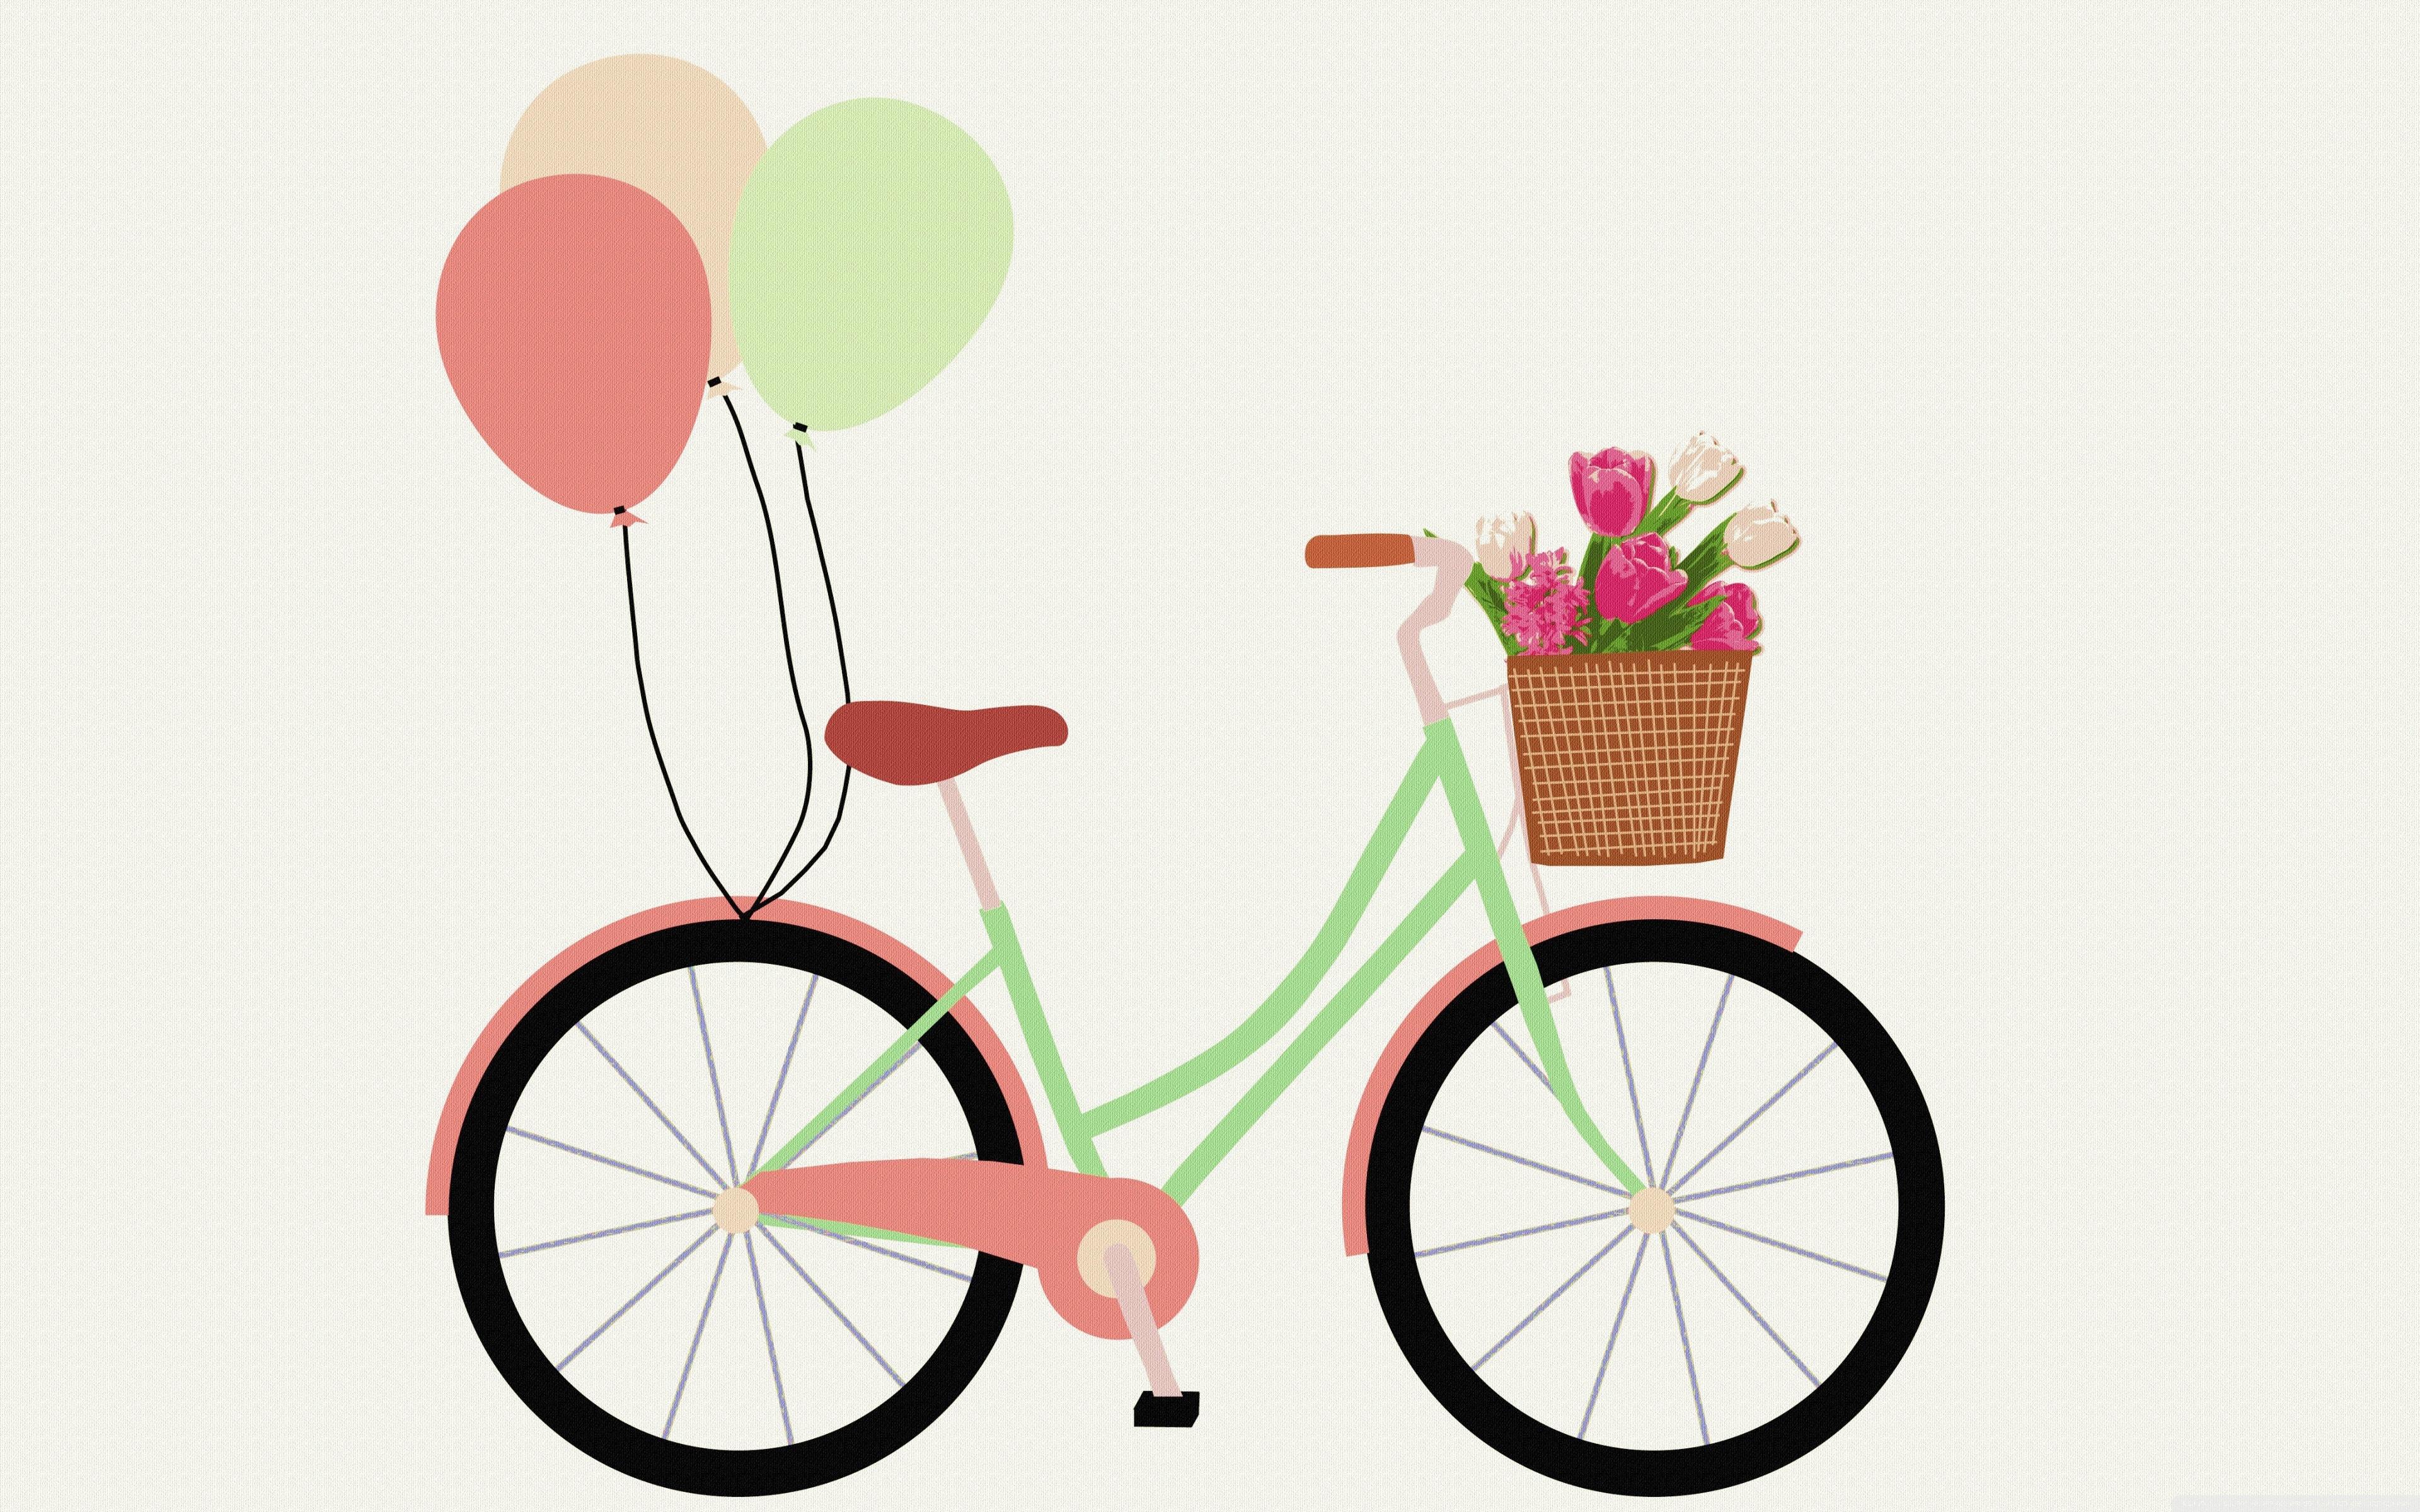 Bicycle clipart floral. Retro k hd desktop